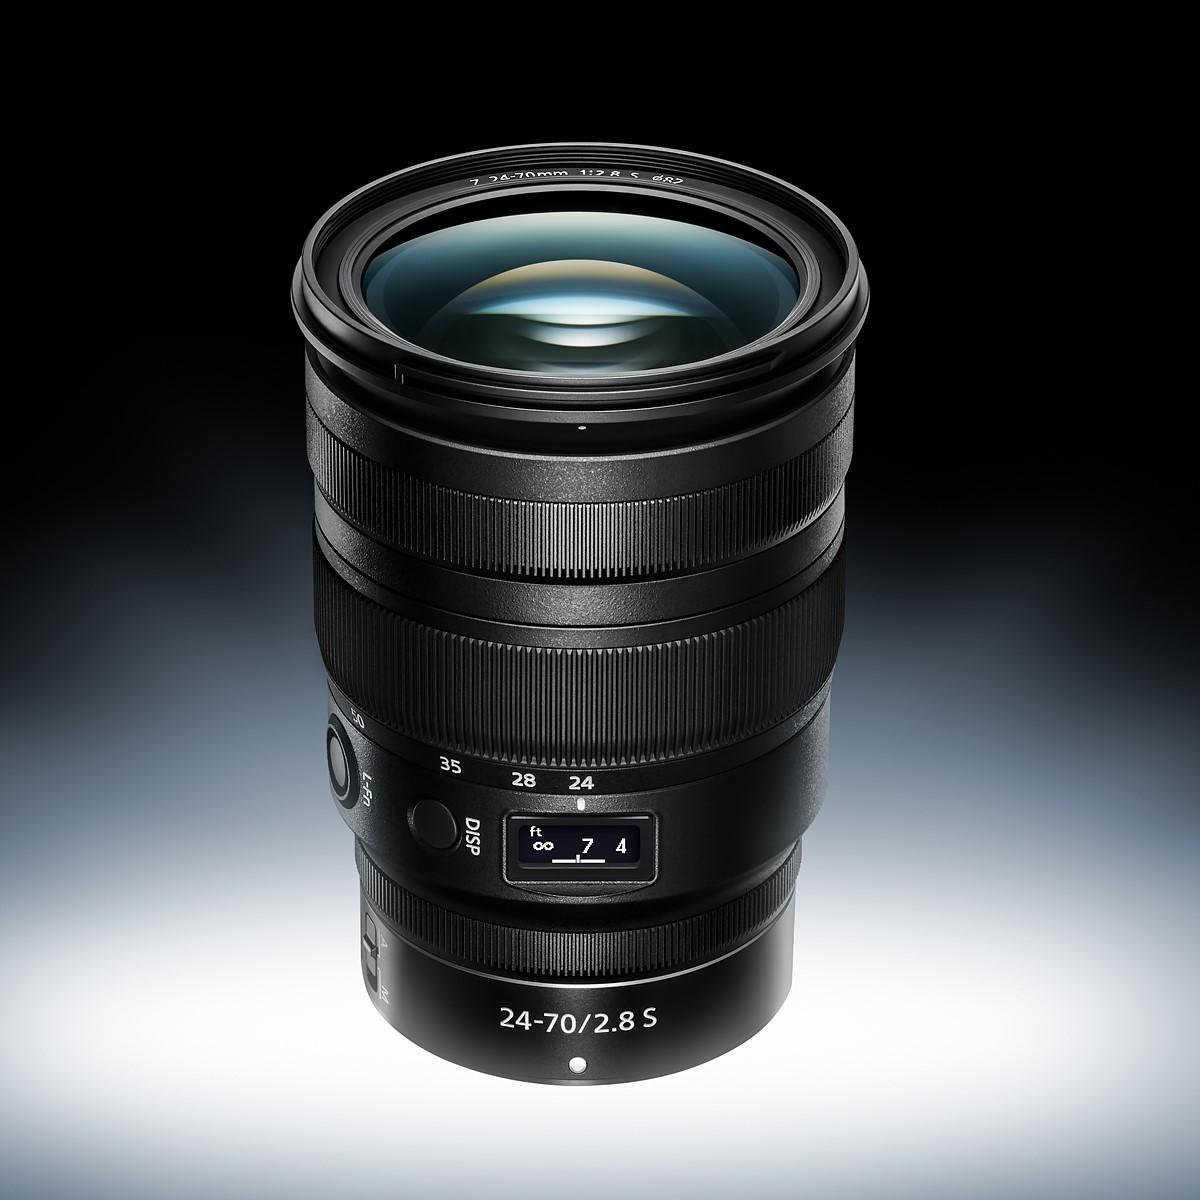 nikon af s zoom nikkor 80 200mm f 2 8d if service repair parts list manual download